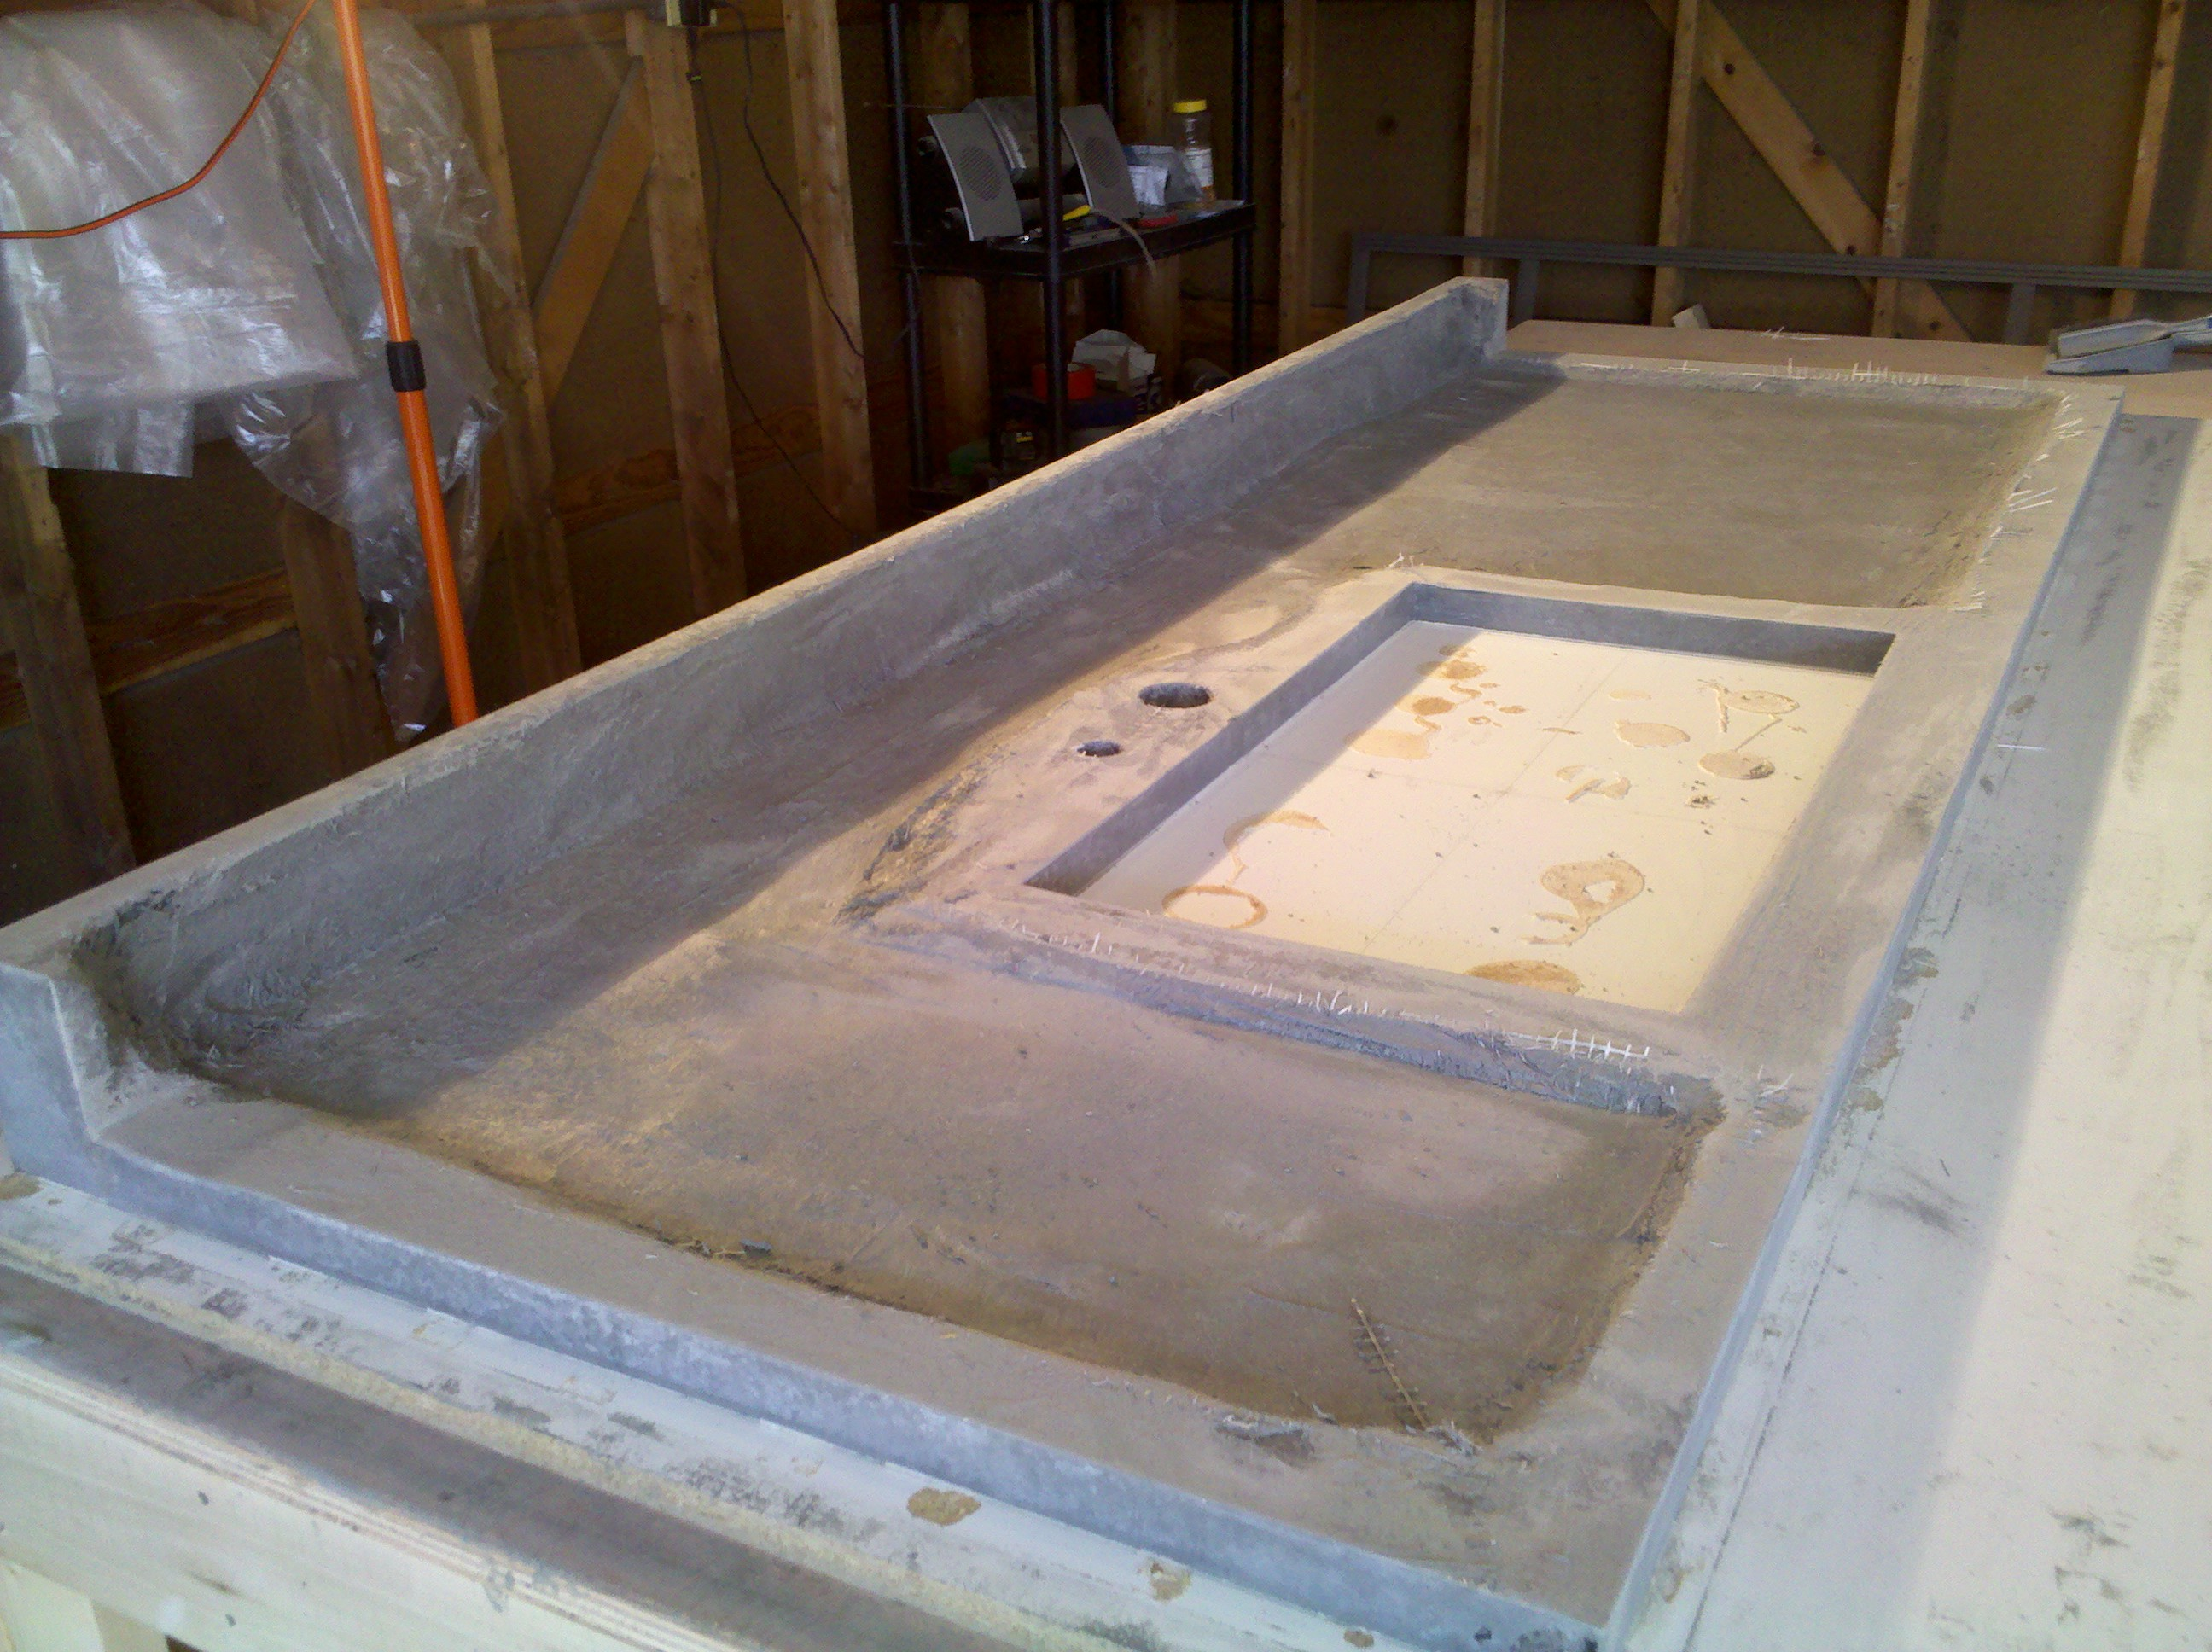 Concrete Countertop Fabrication Fort Wayne IN Nick Dancer